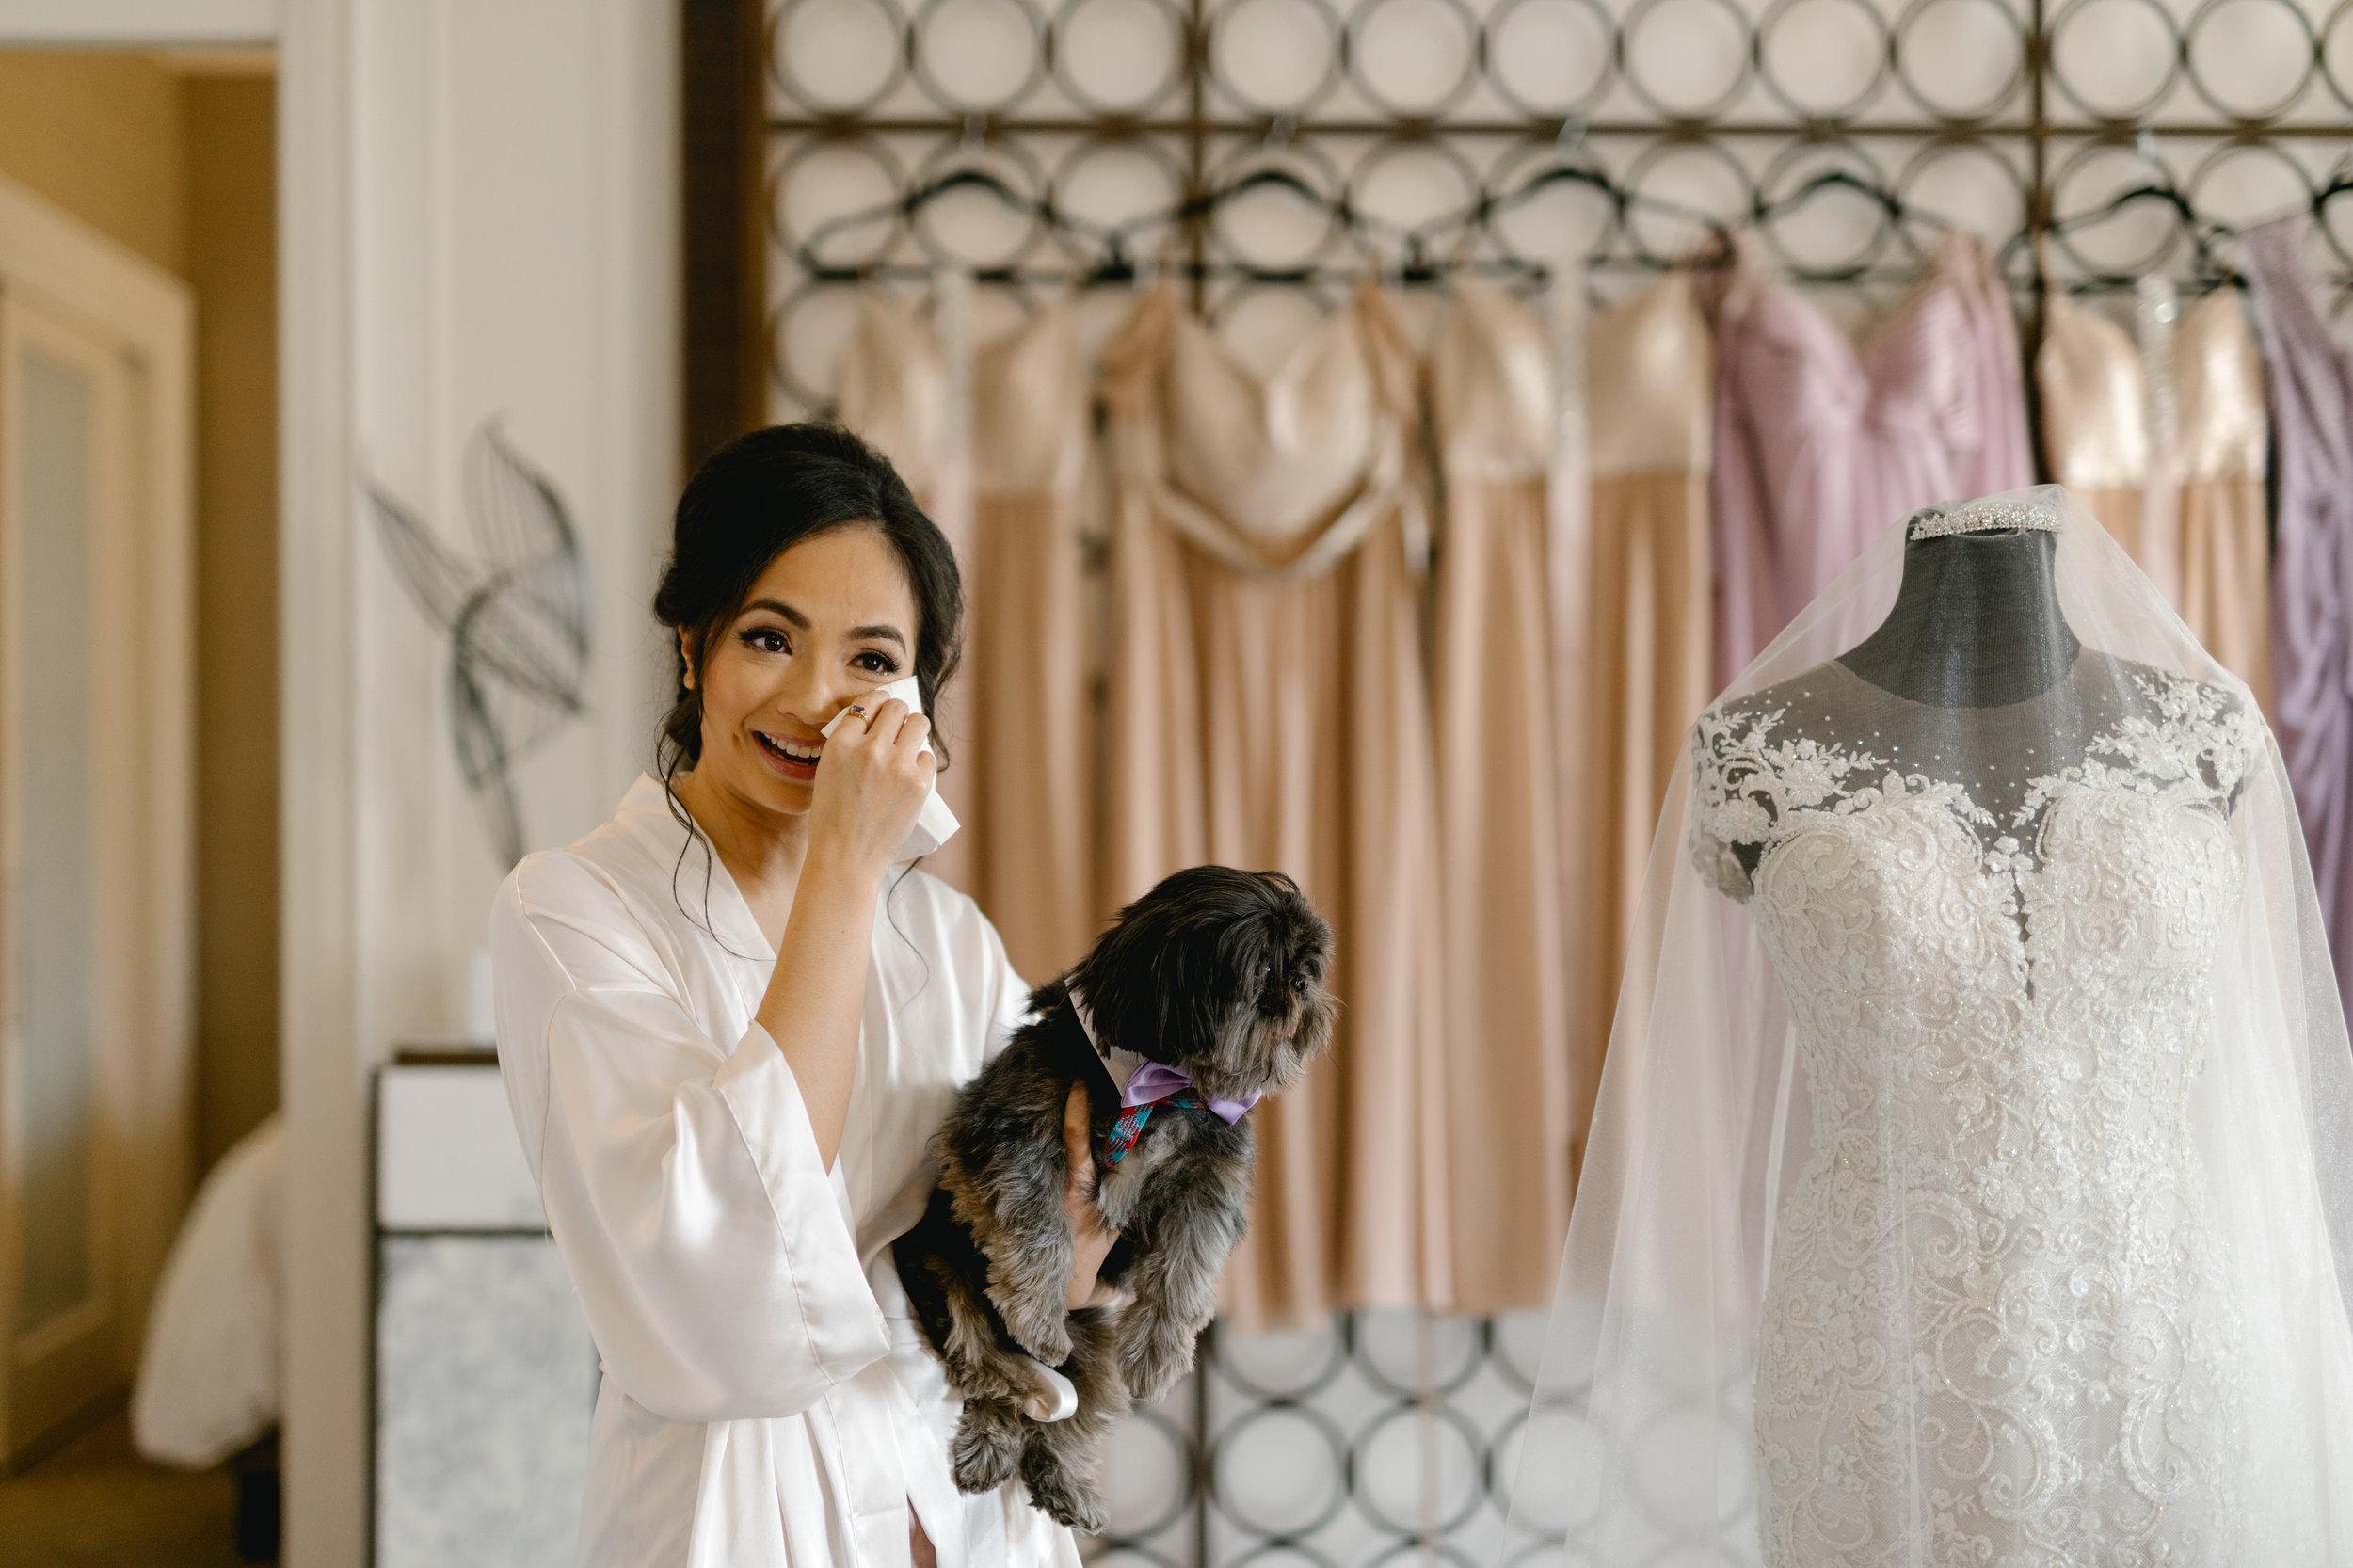 herastudios_wedding_chandy_dale_hera_selects-23.jpg